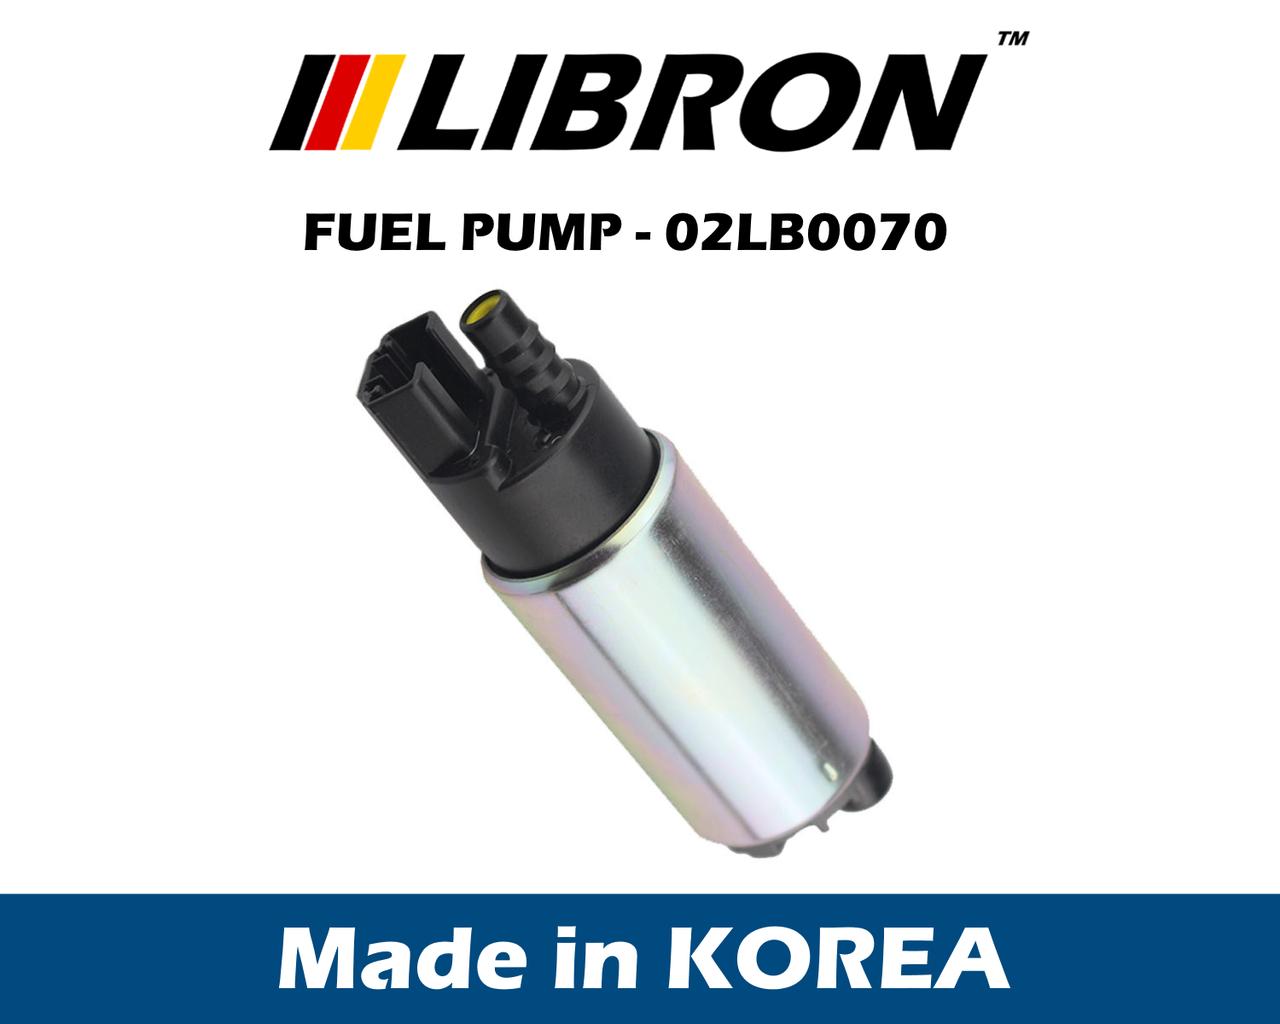 Топливный насос LIBRON 02LB0070 - MAZDA XEDOS 9 (1993-2000)